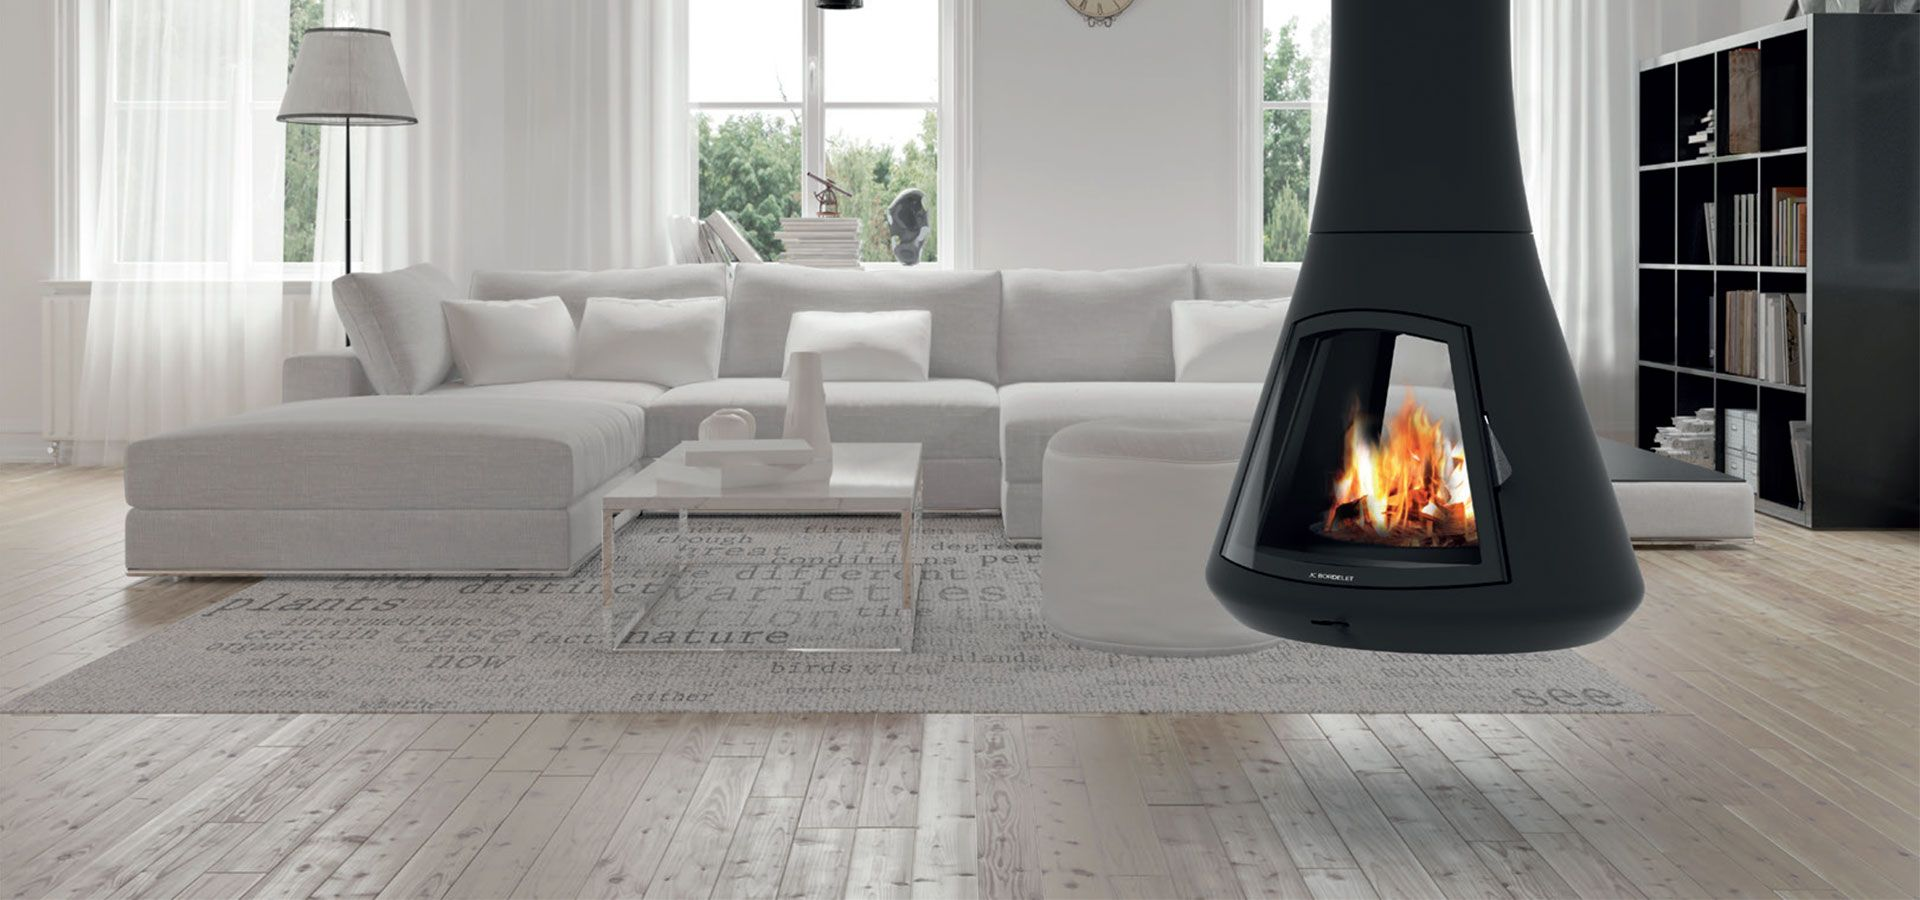 nouvelle chemin e suspendue calista batinfo. Black Bedroom Furniture Sets. Home Design Ideas